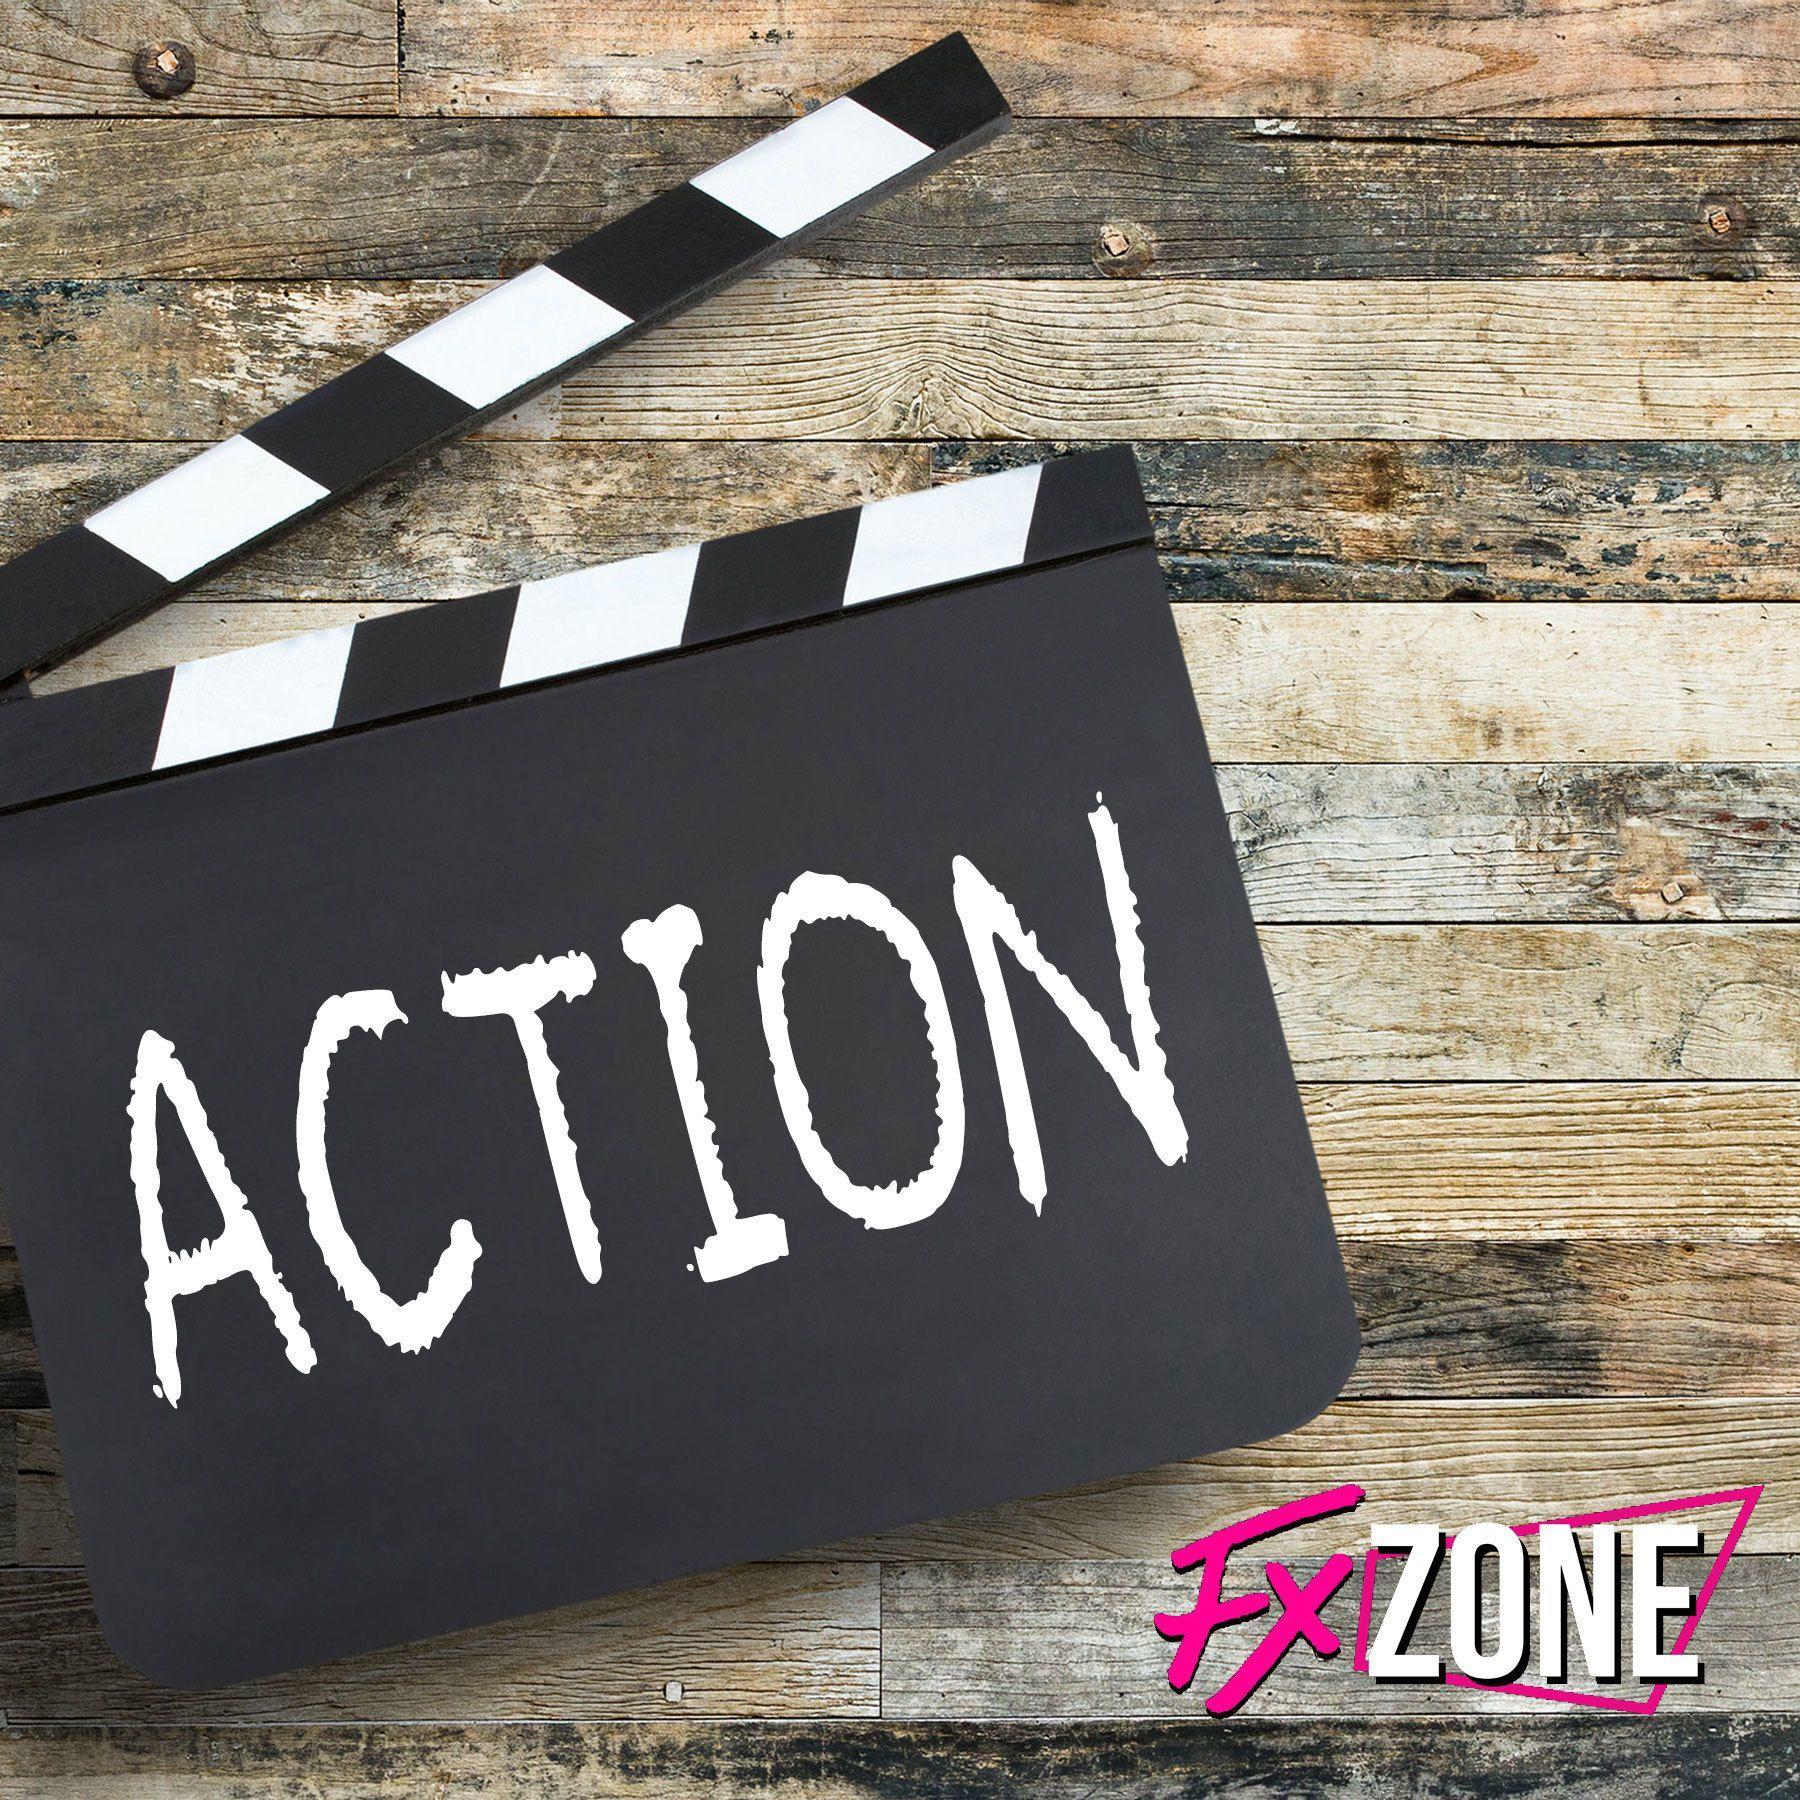 action sign FX Zone logo